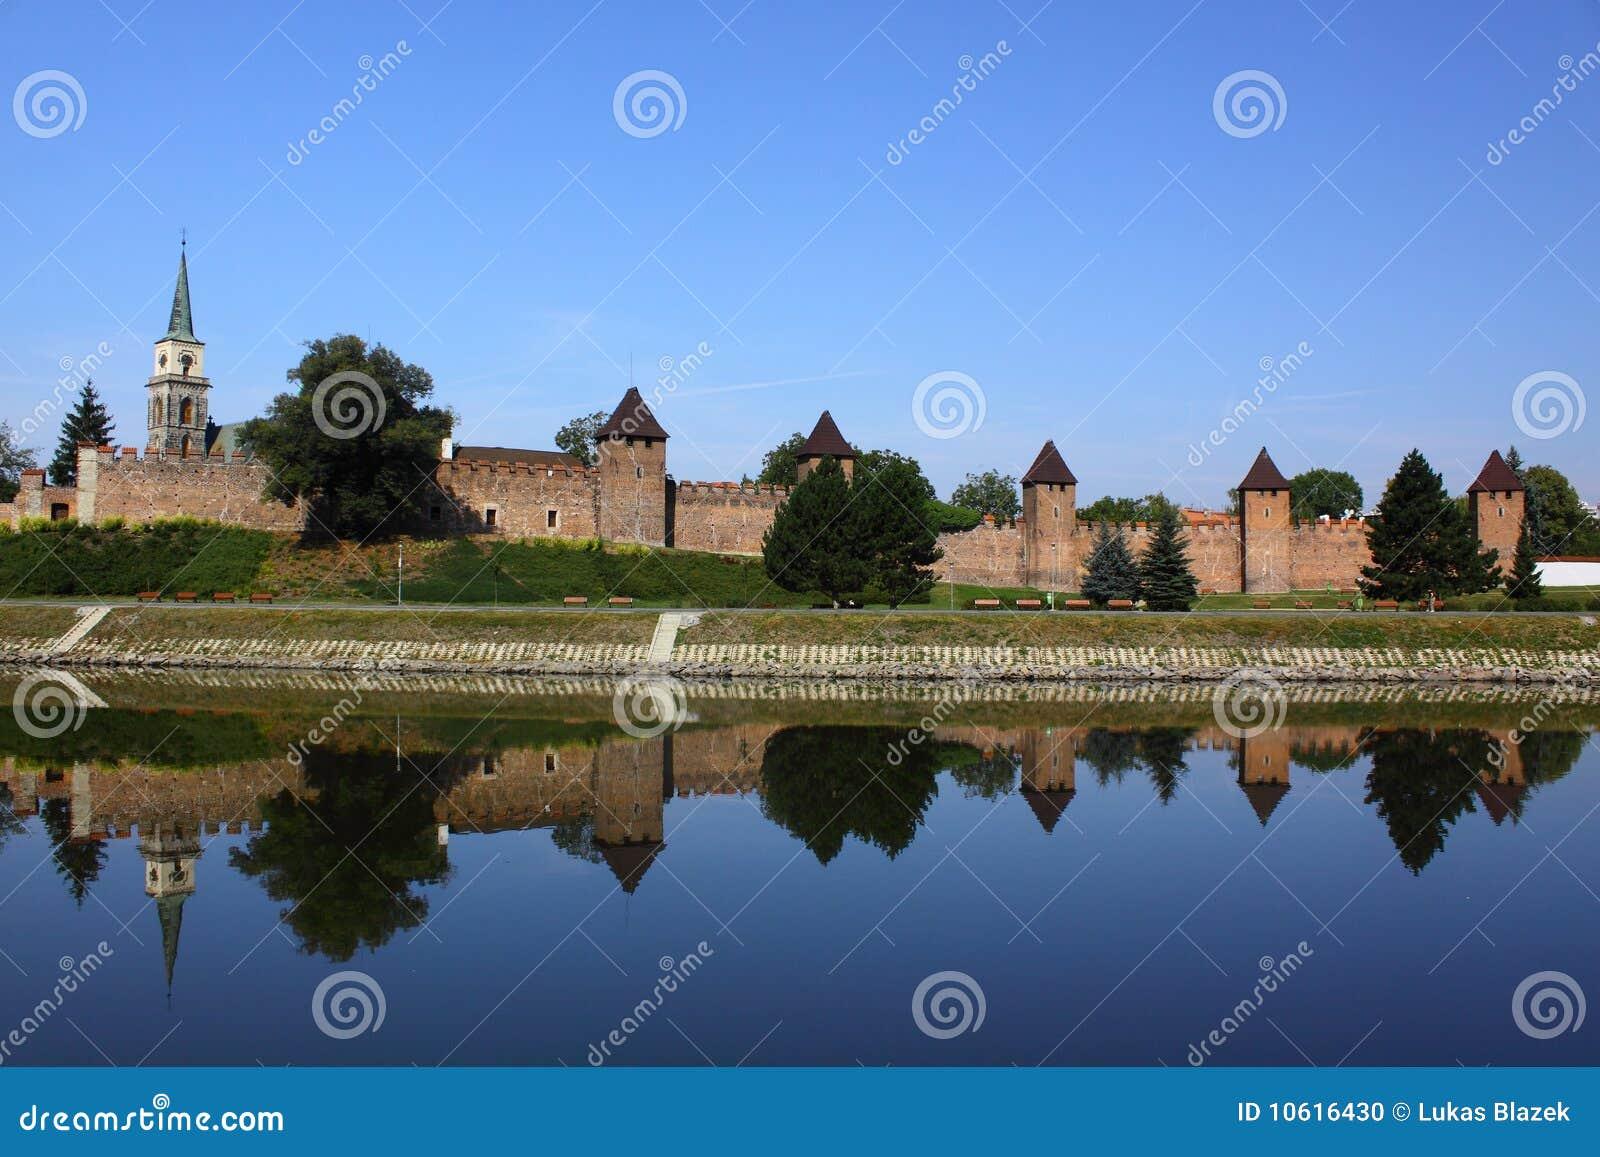 Fortification medieval em Nymburk